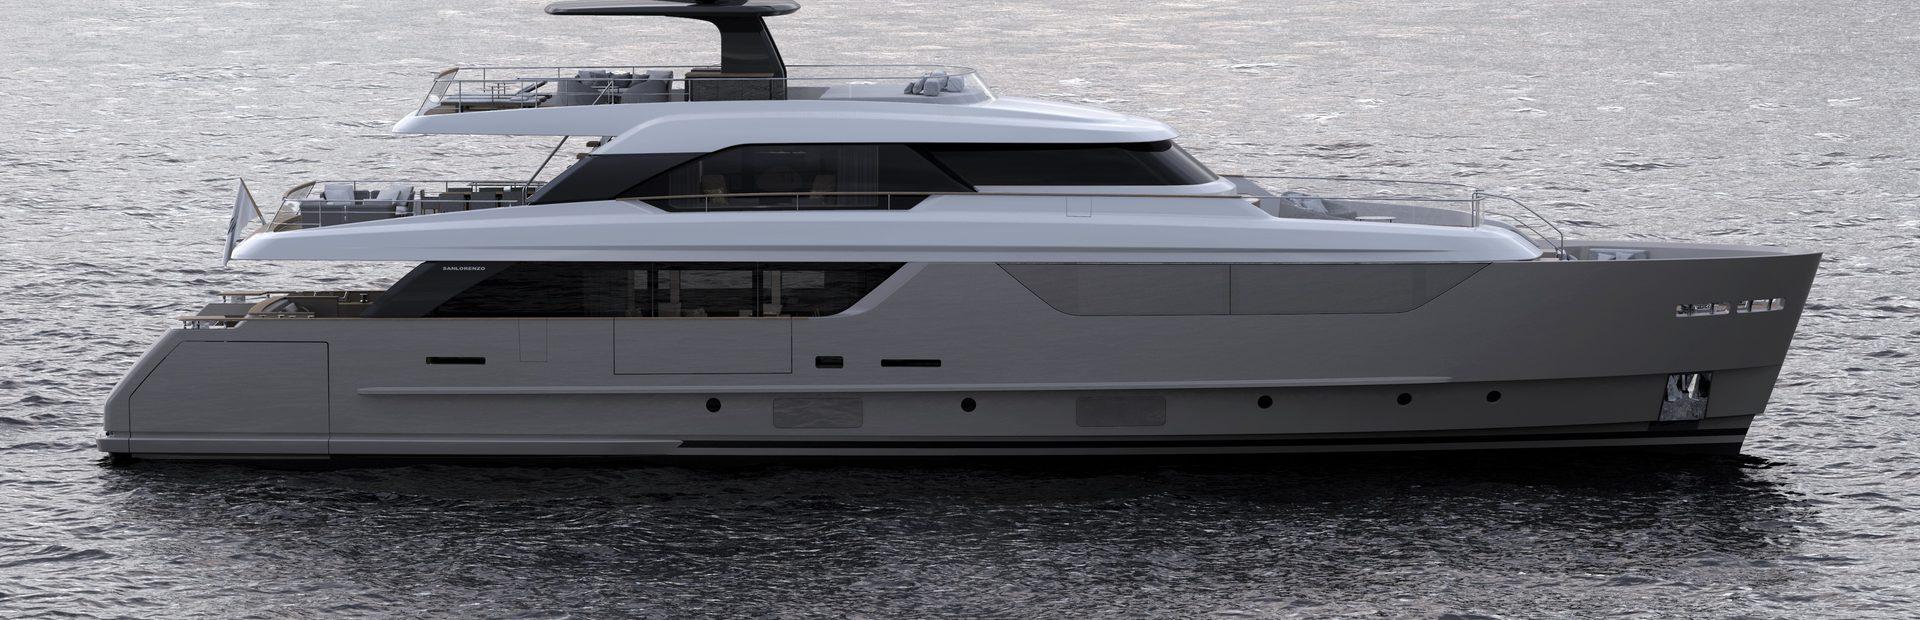 SD118 Yacht Charter